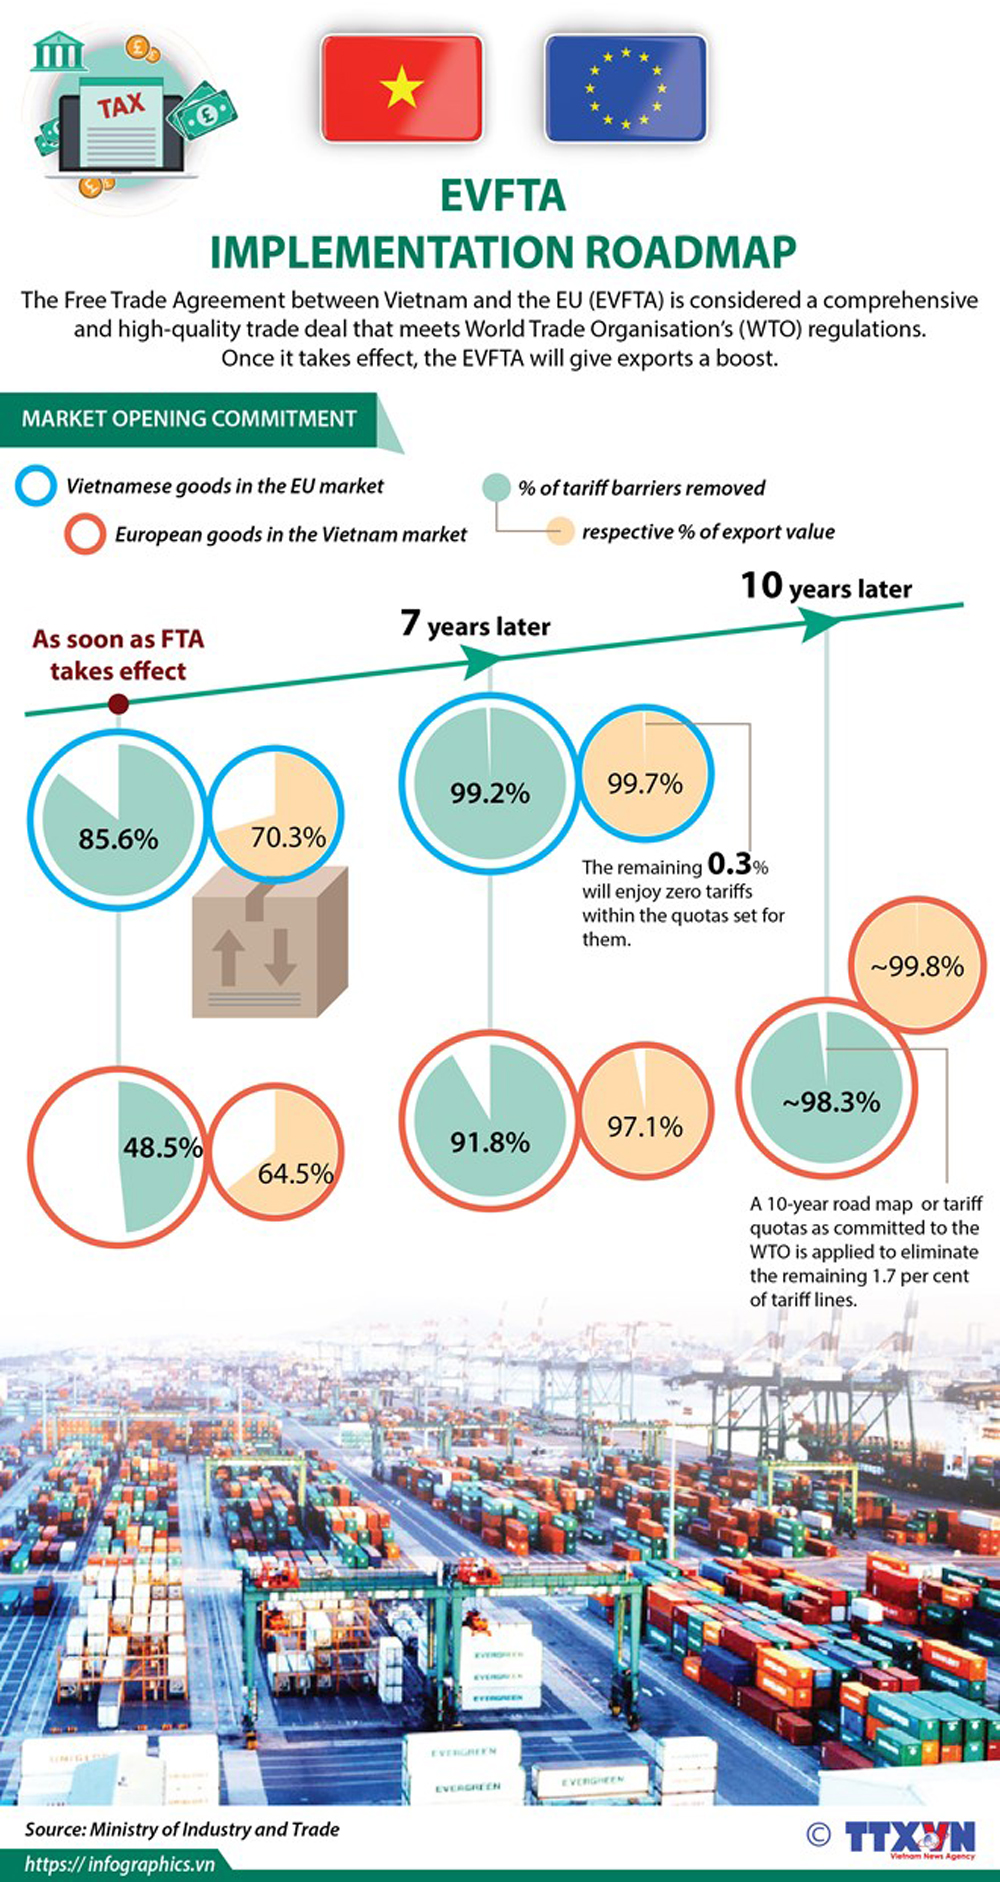 EVFTA, implementation roadmap, international integration, economic development